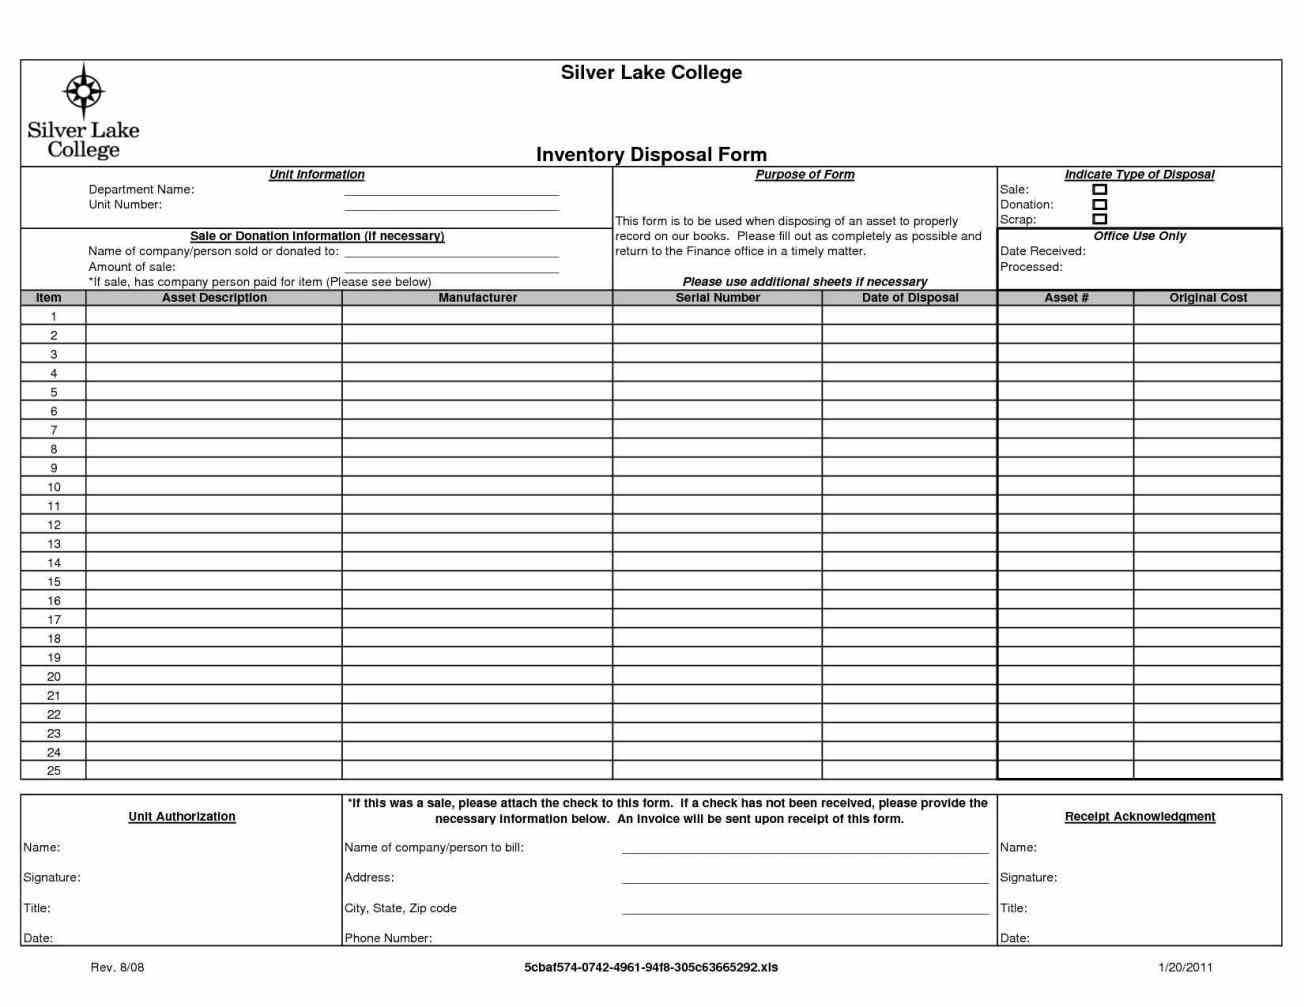 Inventory Control Excel Template Eliolera In Inventory Control Forms With Inventory Control Forms